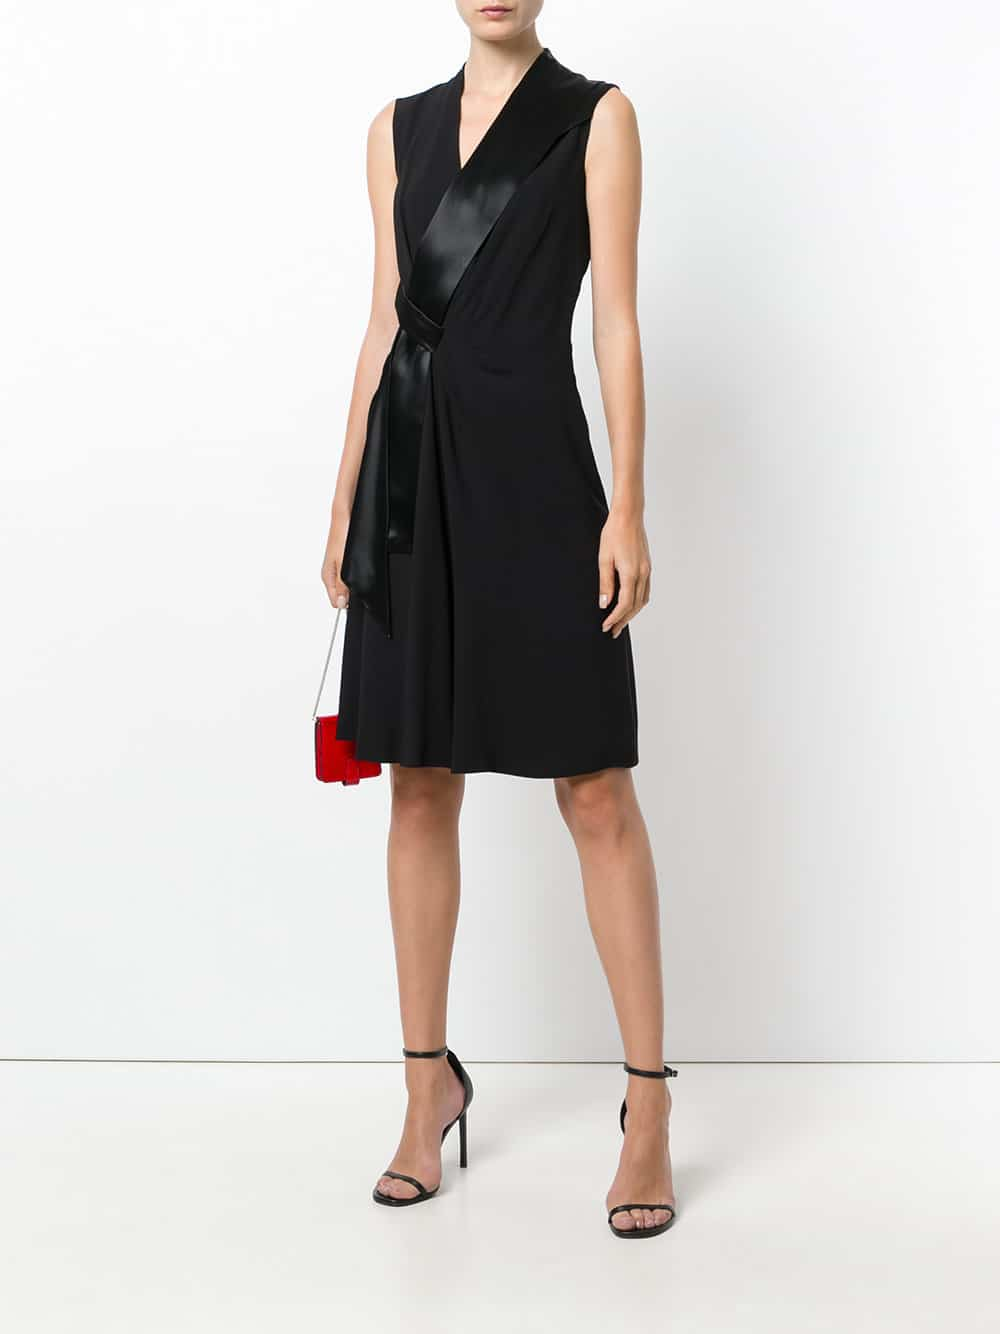 LANVIN Side Tie Midi Black Dress